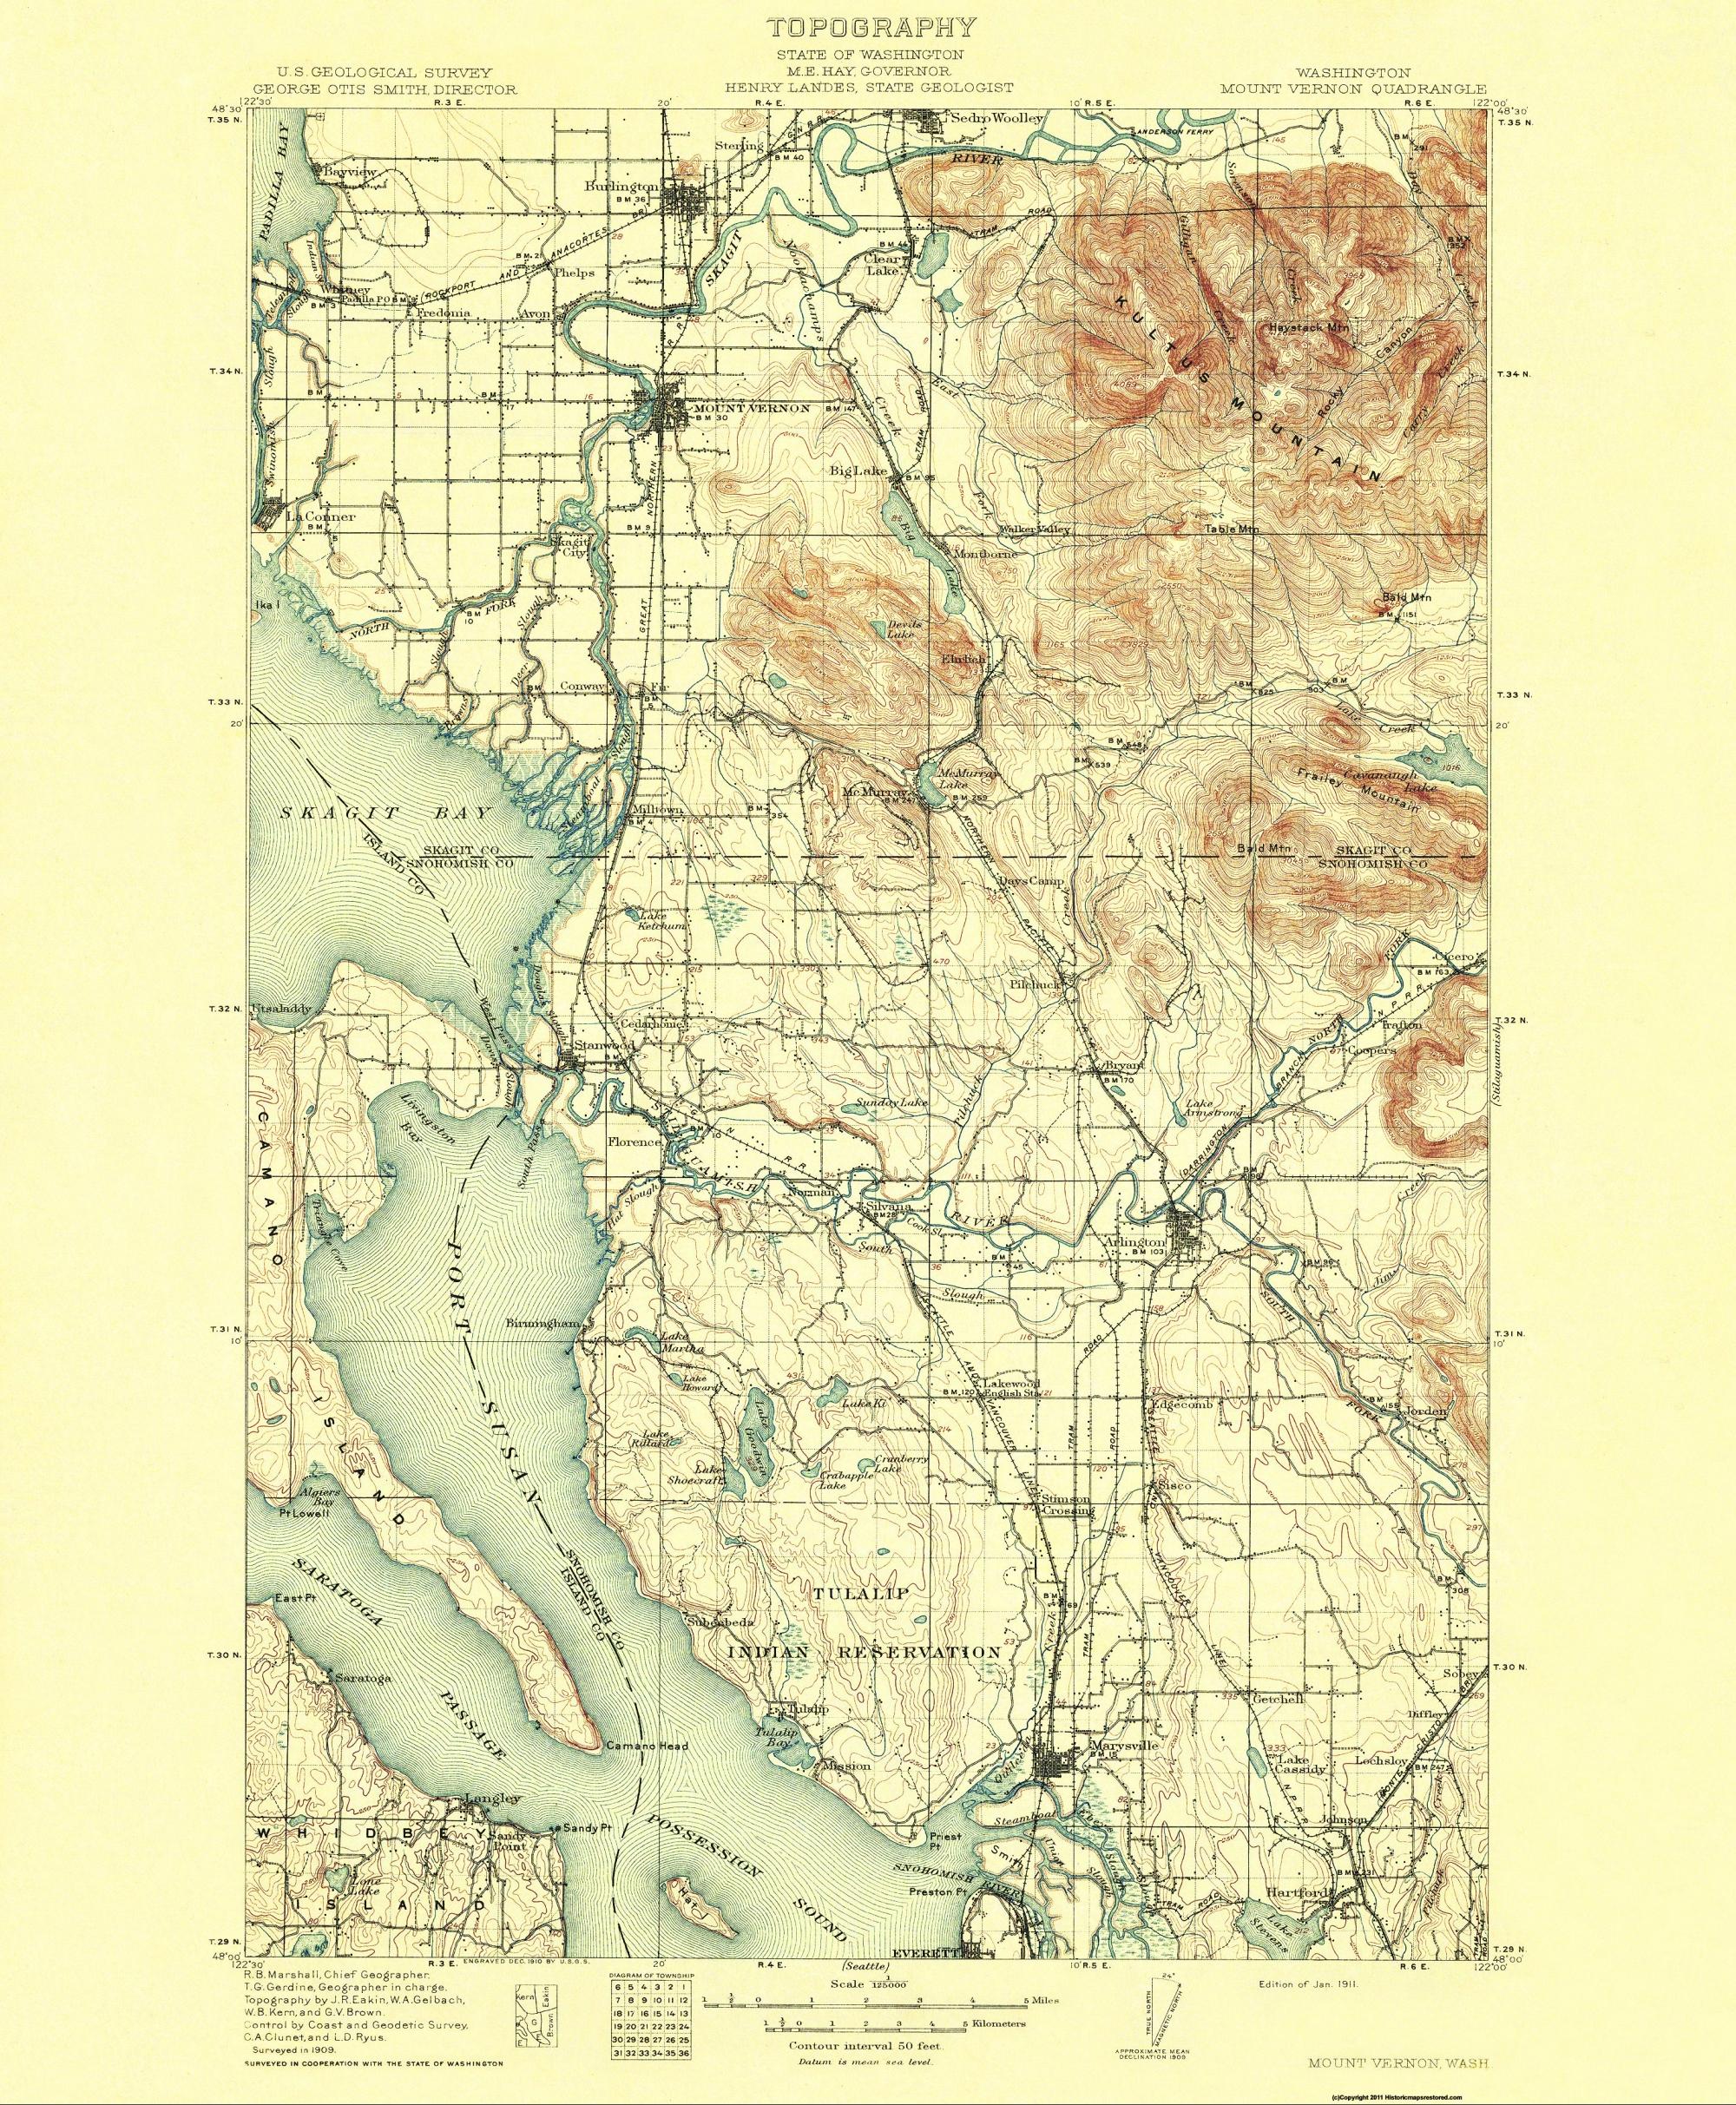 Mt Vernon Washington Map.Old Topographical Map Mt Vernon Washington 1911